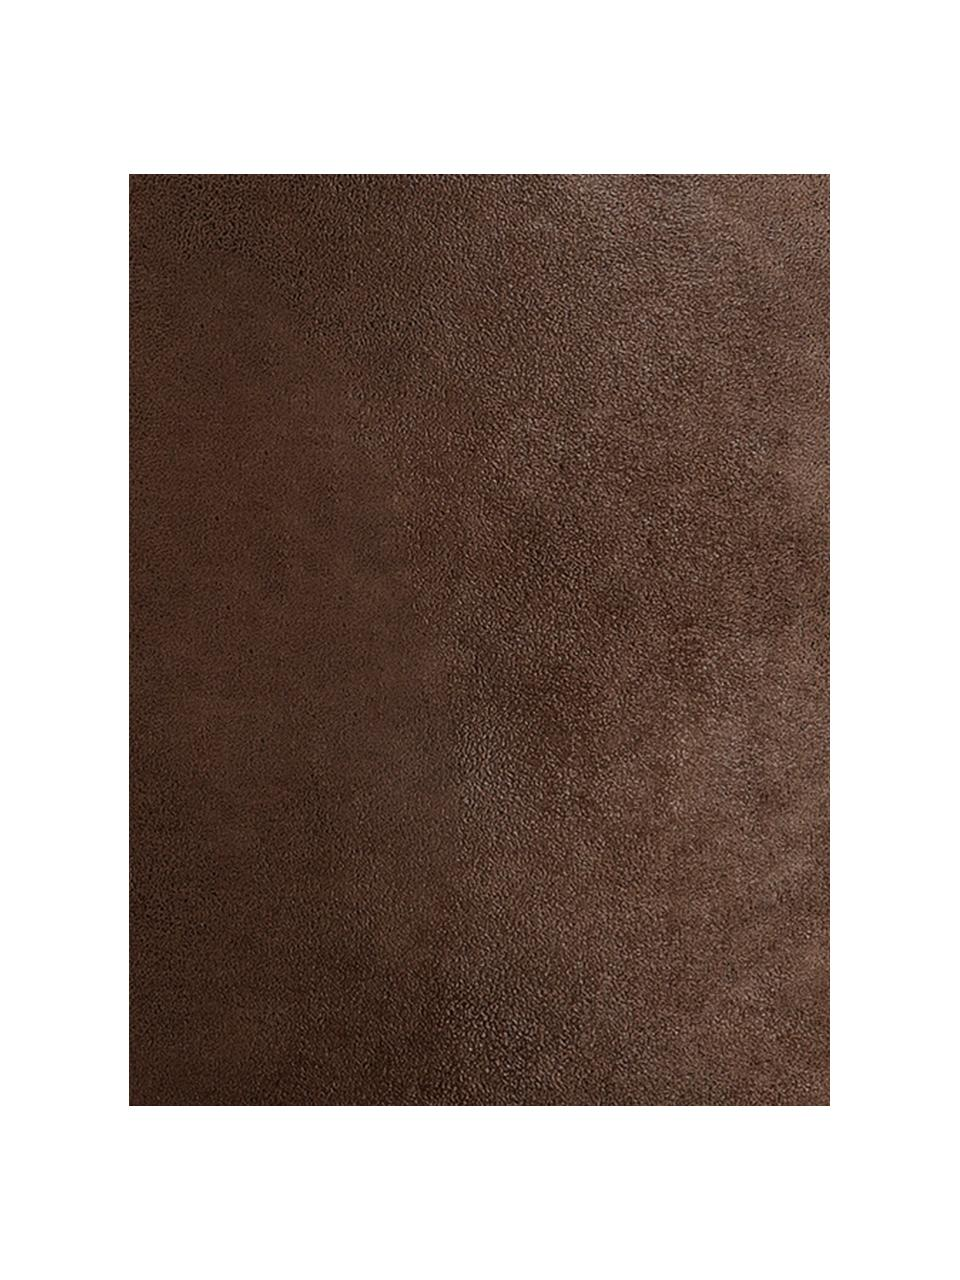 Kunstleder-Pouf Cuba, Bezug: Kunstleder (96% Polyester, Braun, Ø 50 x H 30 cm